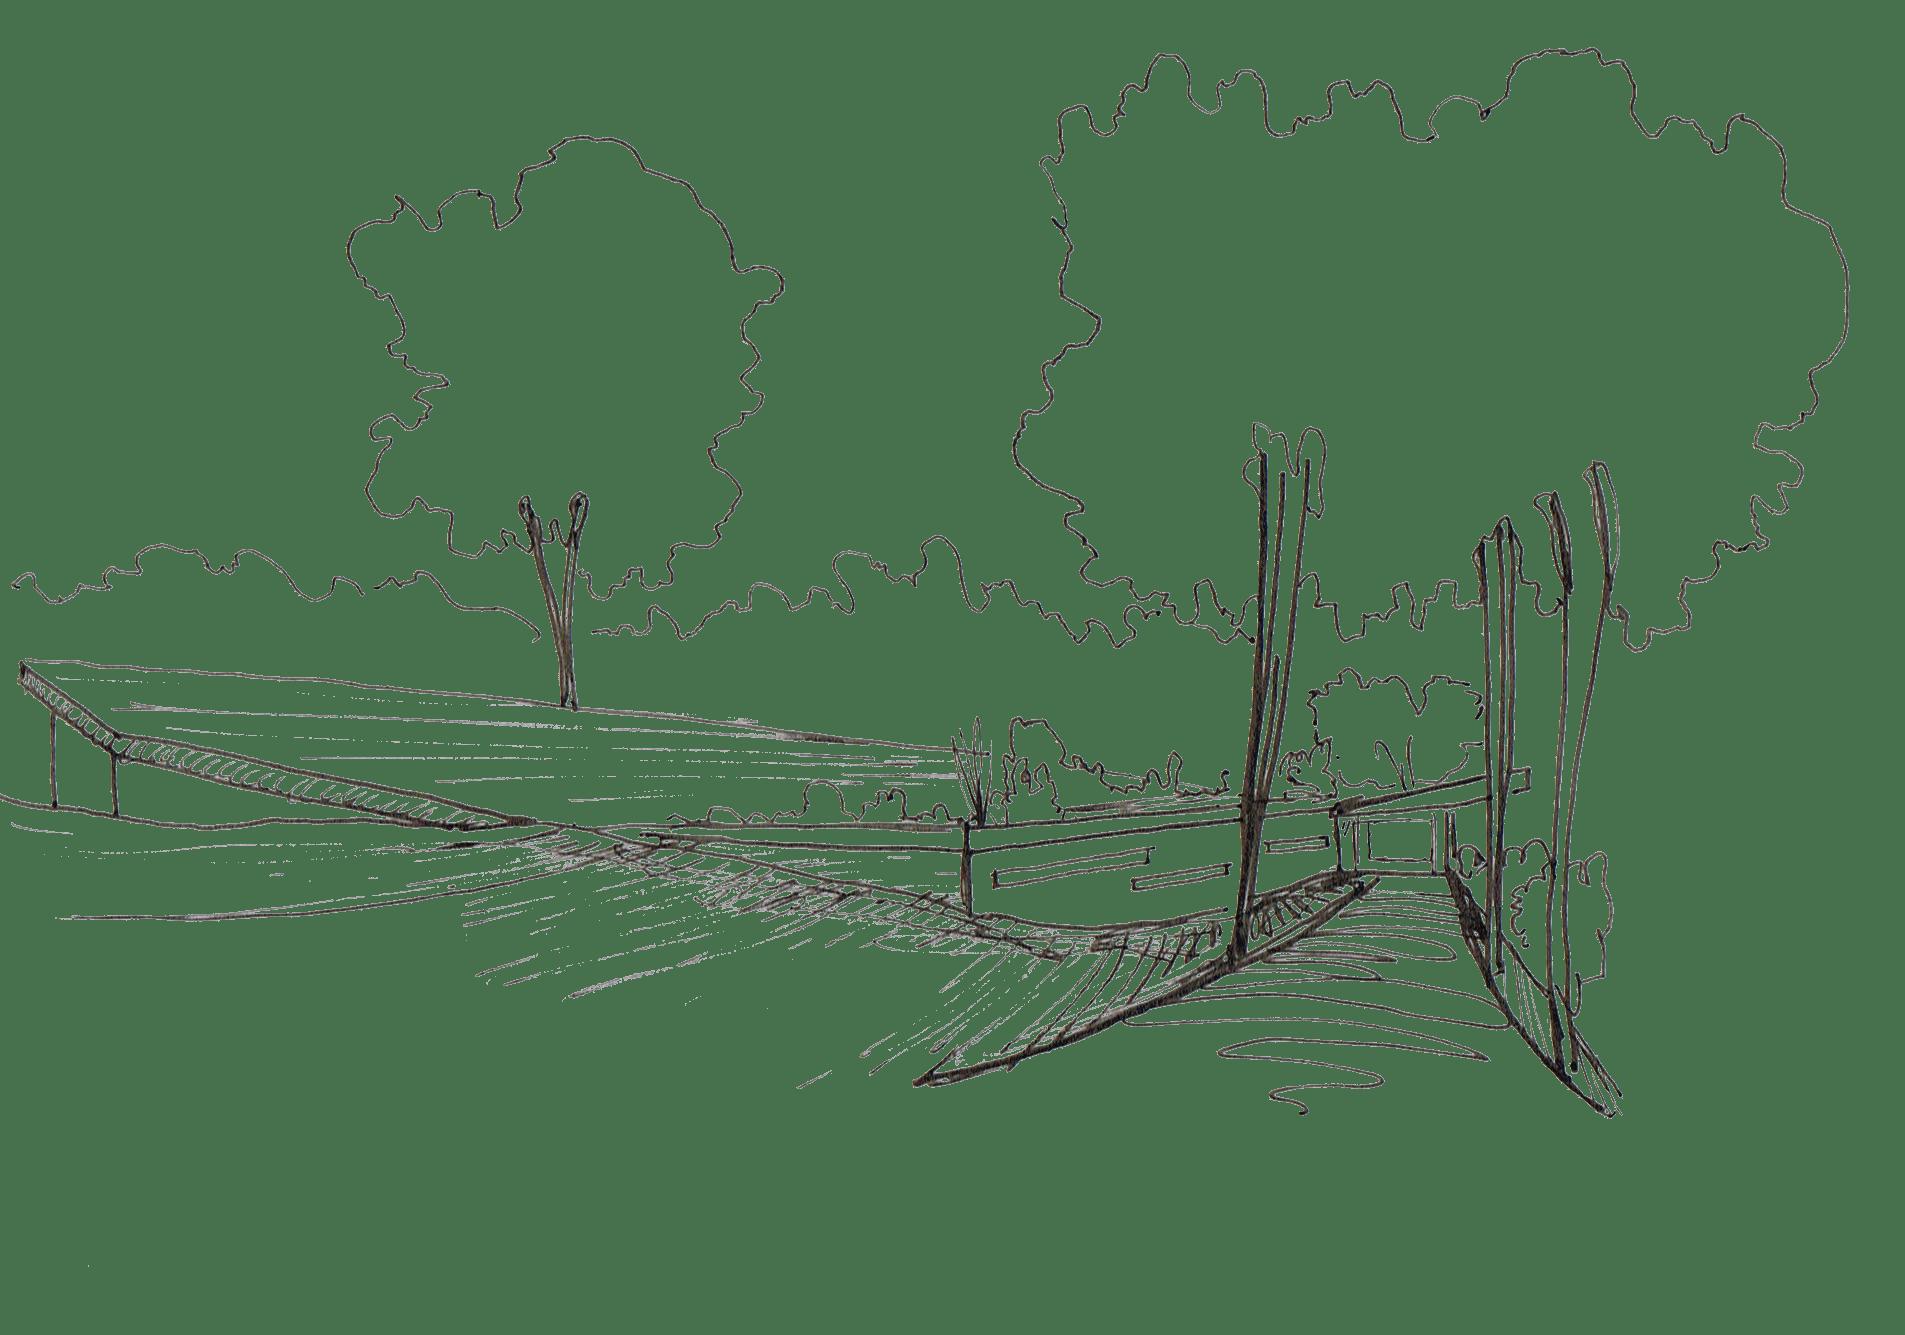 Building Concept Sketches